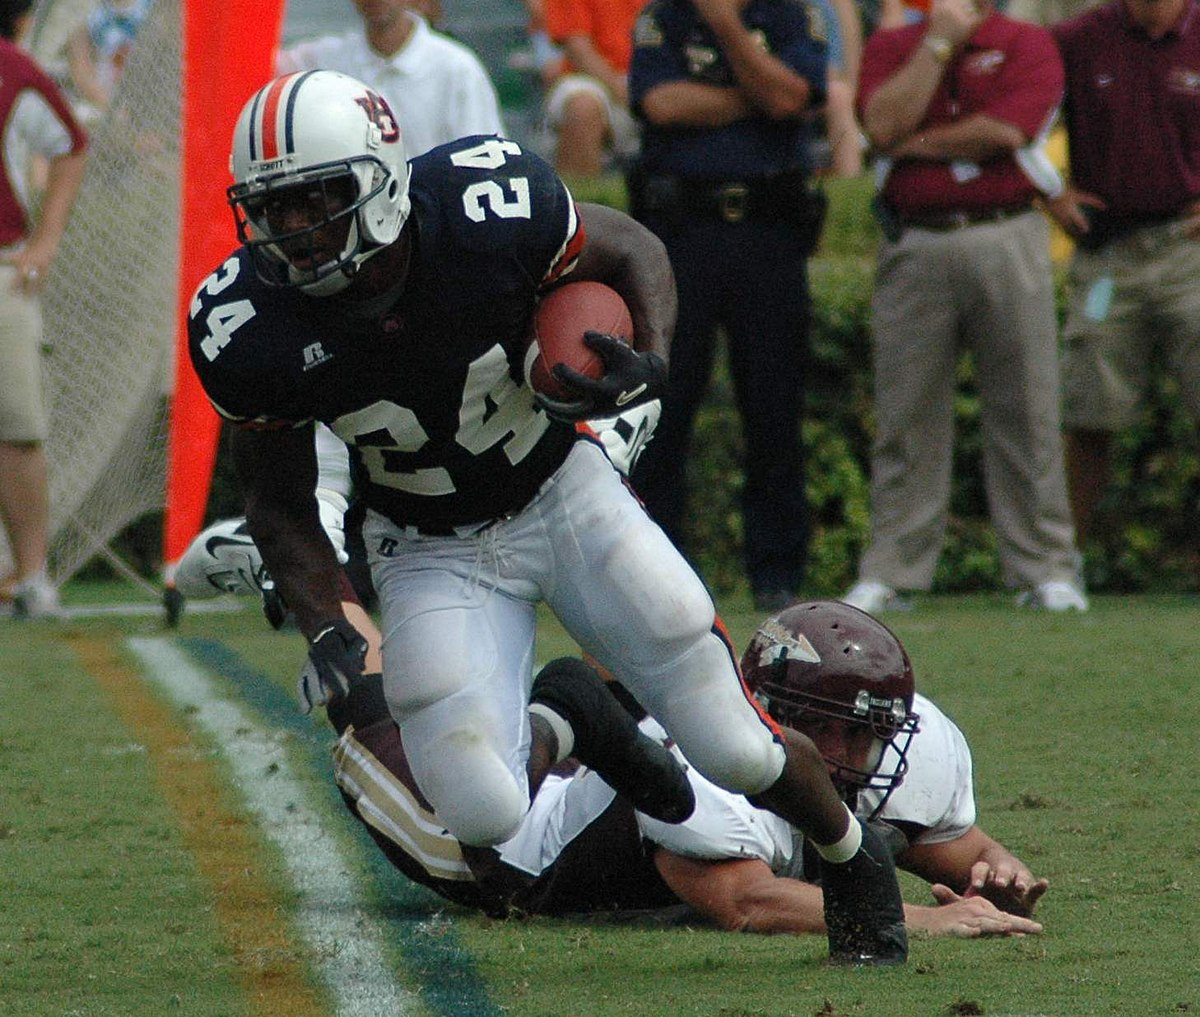 Jones Cadillac: Mr. Football Award (Alabama)